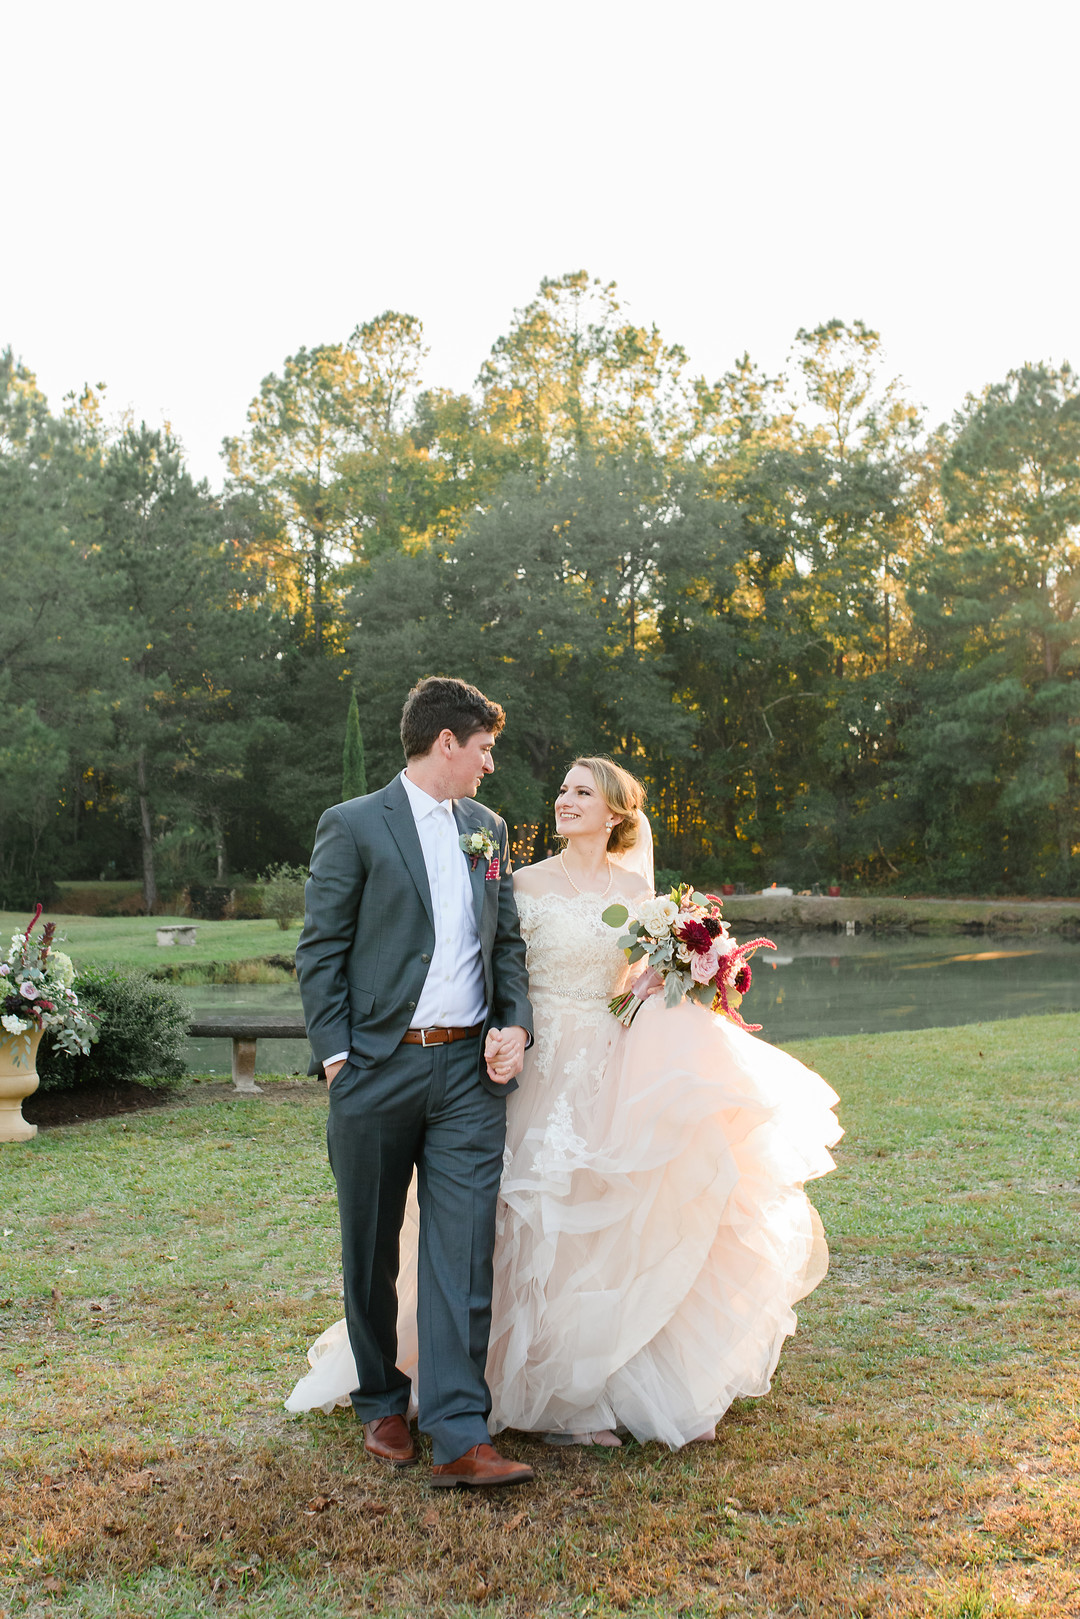 old-wide-awake-plantation-wedding-34.JPG